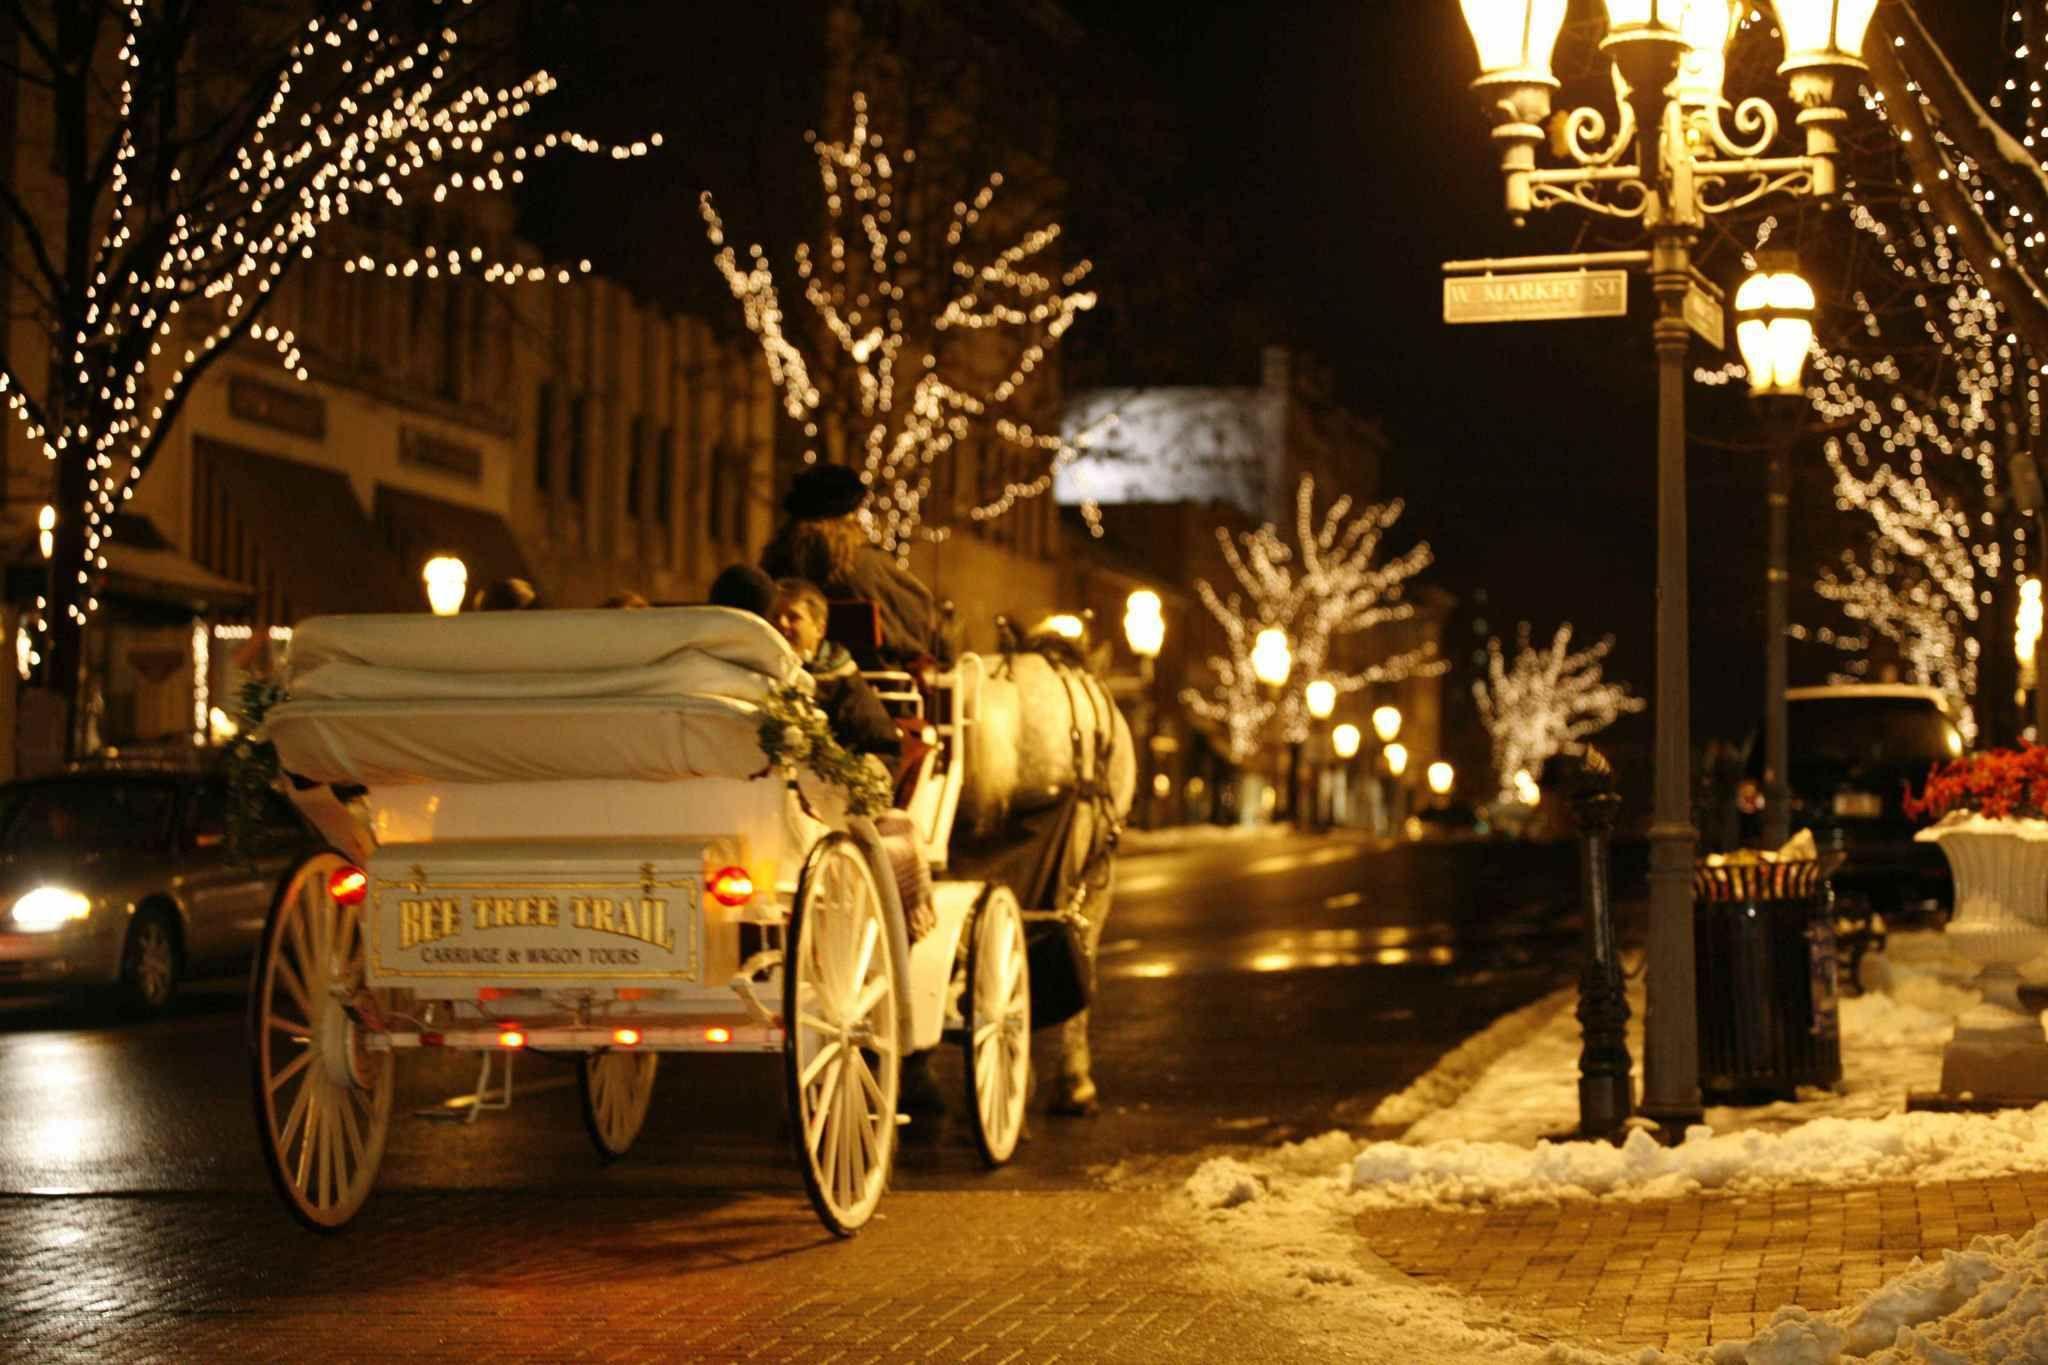 Christmas City Lights Pics from Tumblr – Happy Holidays! | Christ ...